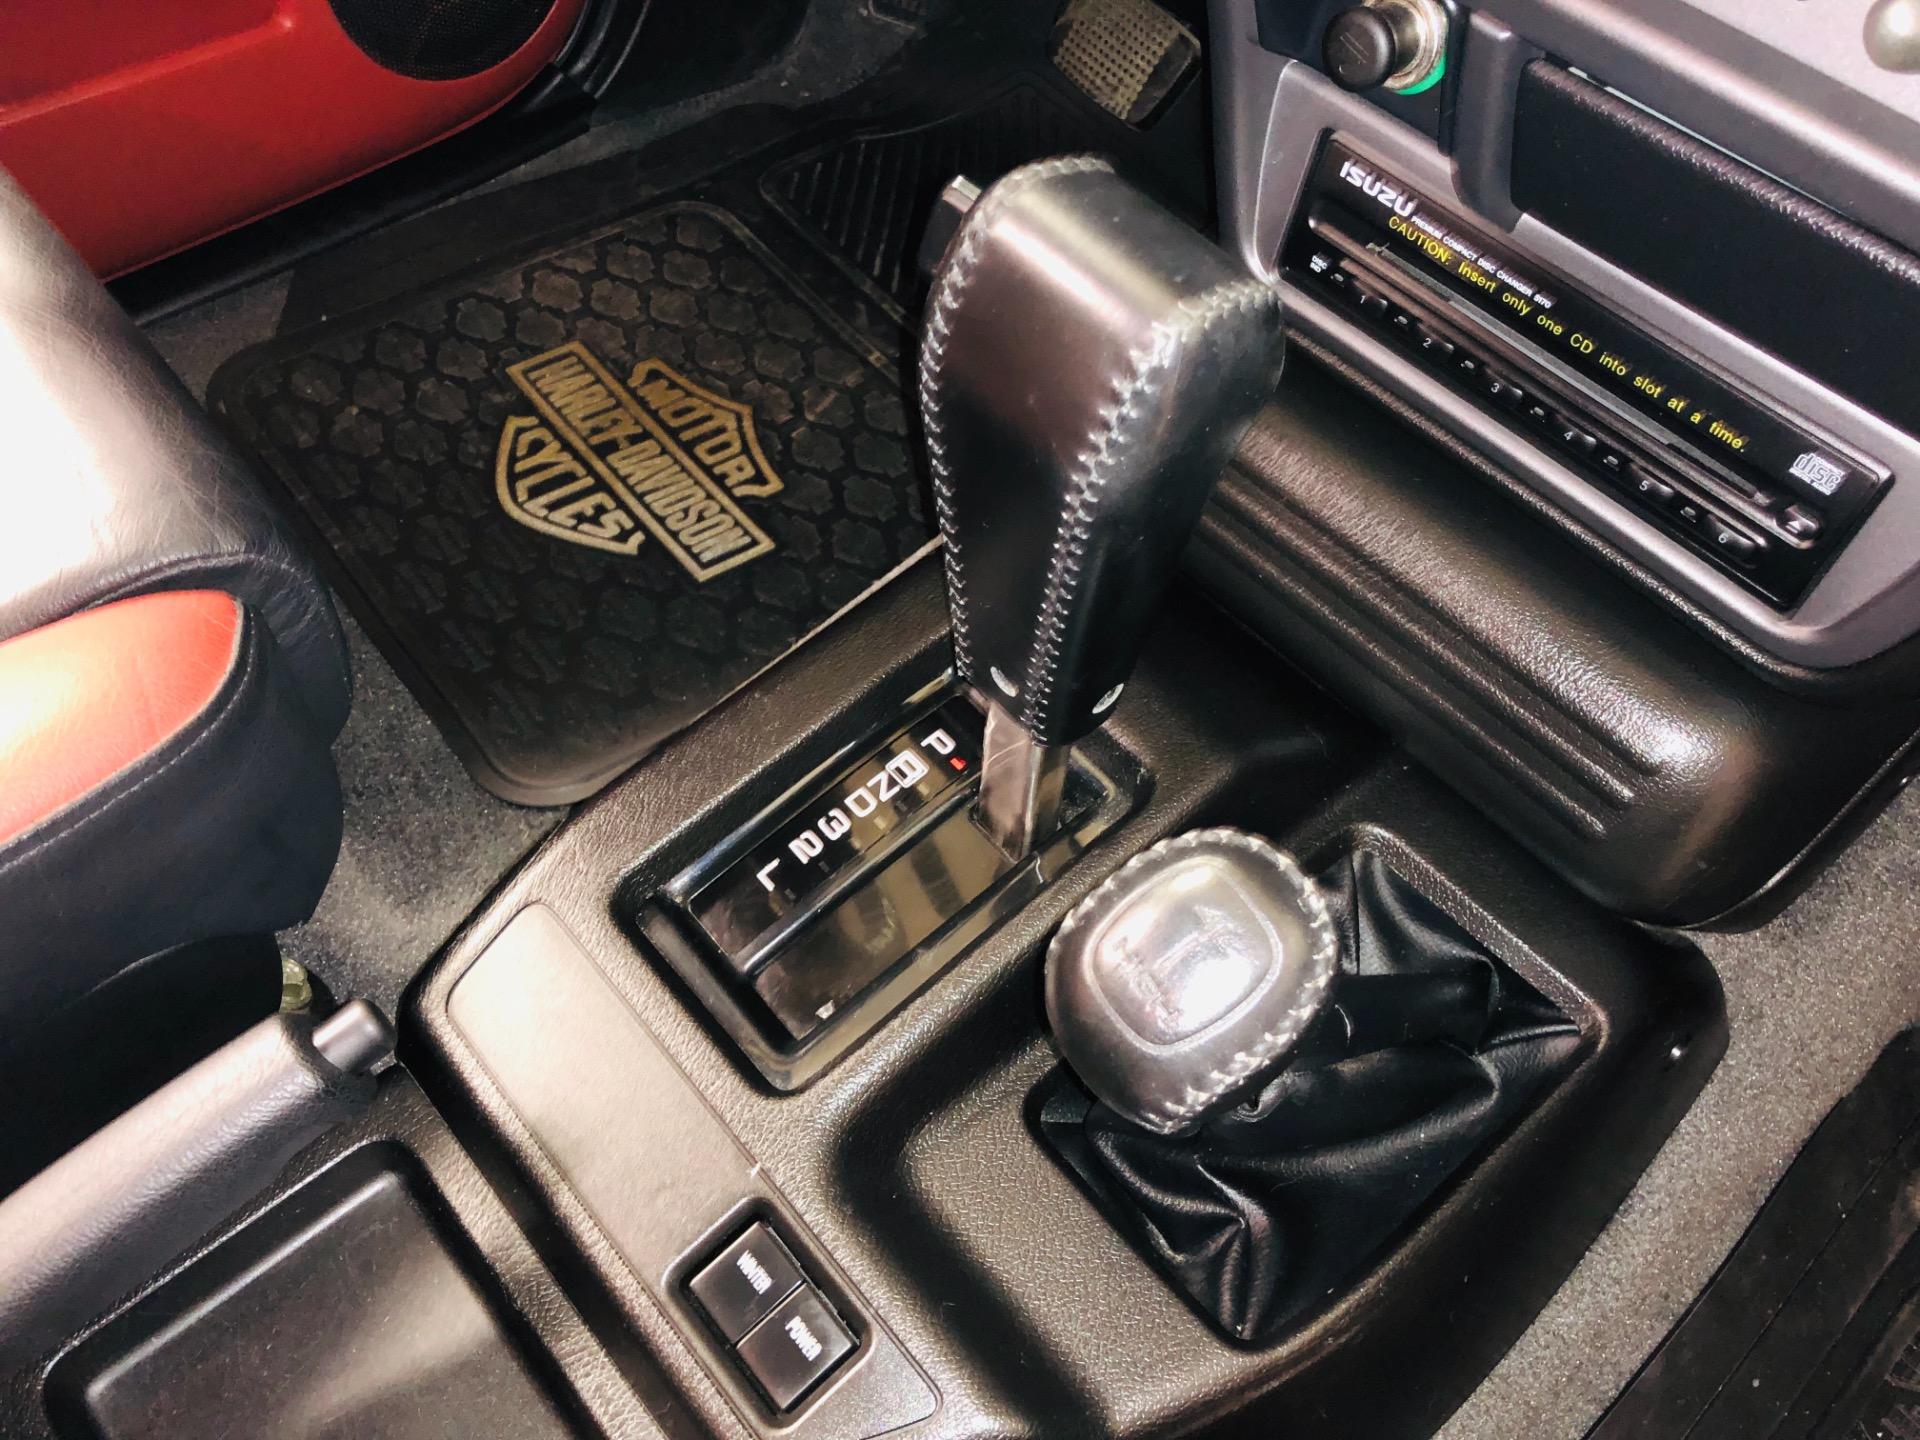 Used 1999 Isuzu VehiCross SUV-HARLEY DAVIDSON SUPERCHARGED | Mundelein, IL